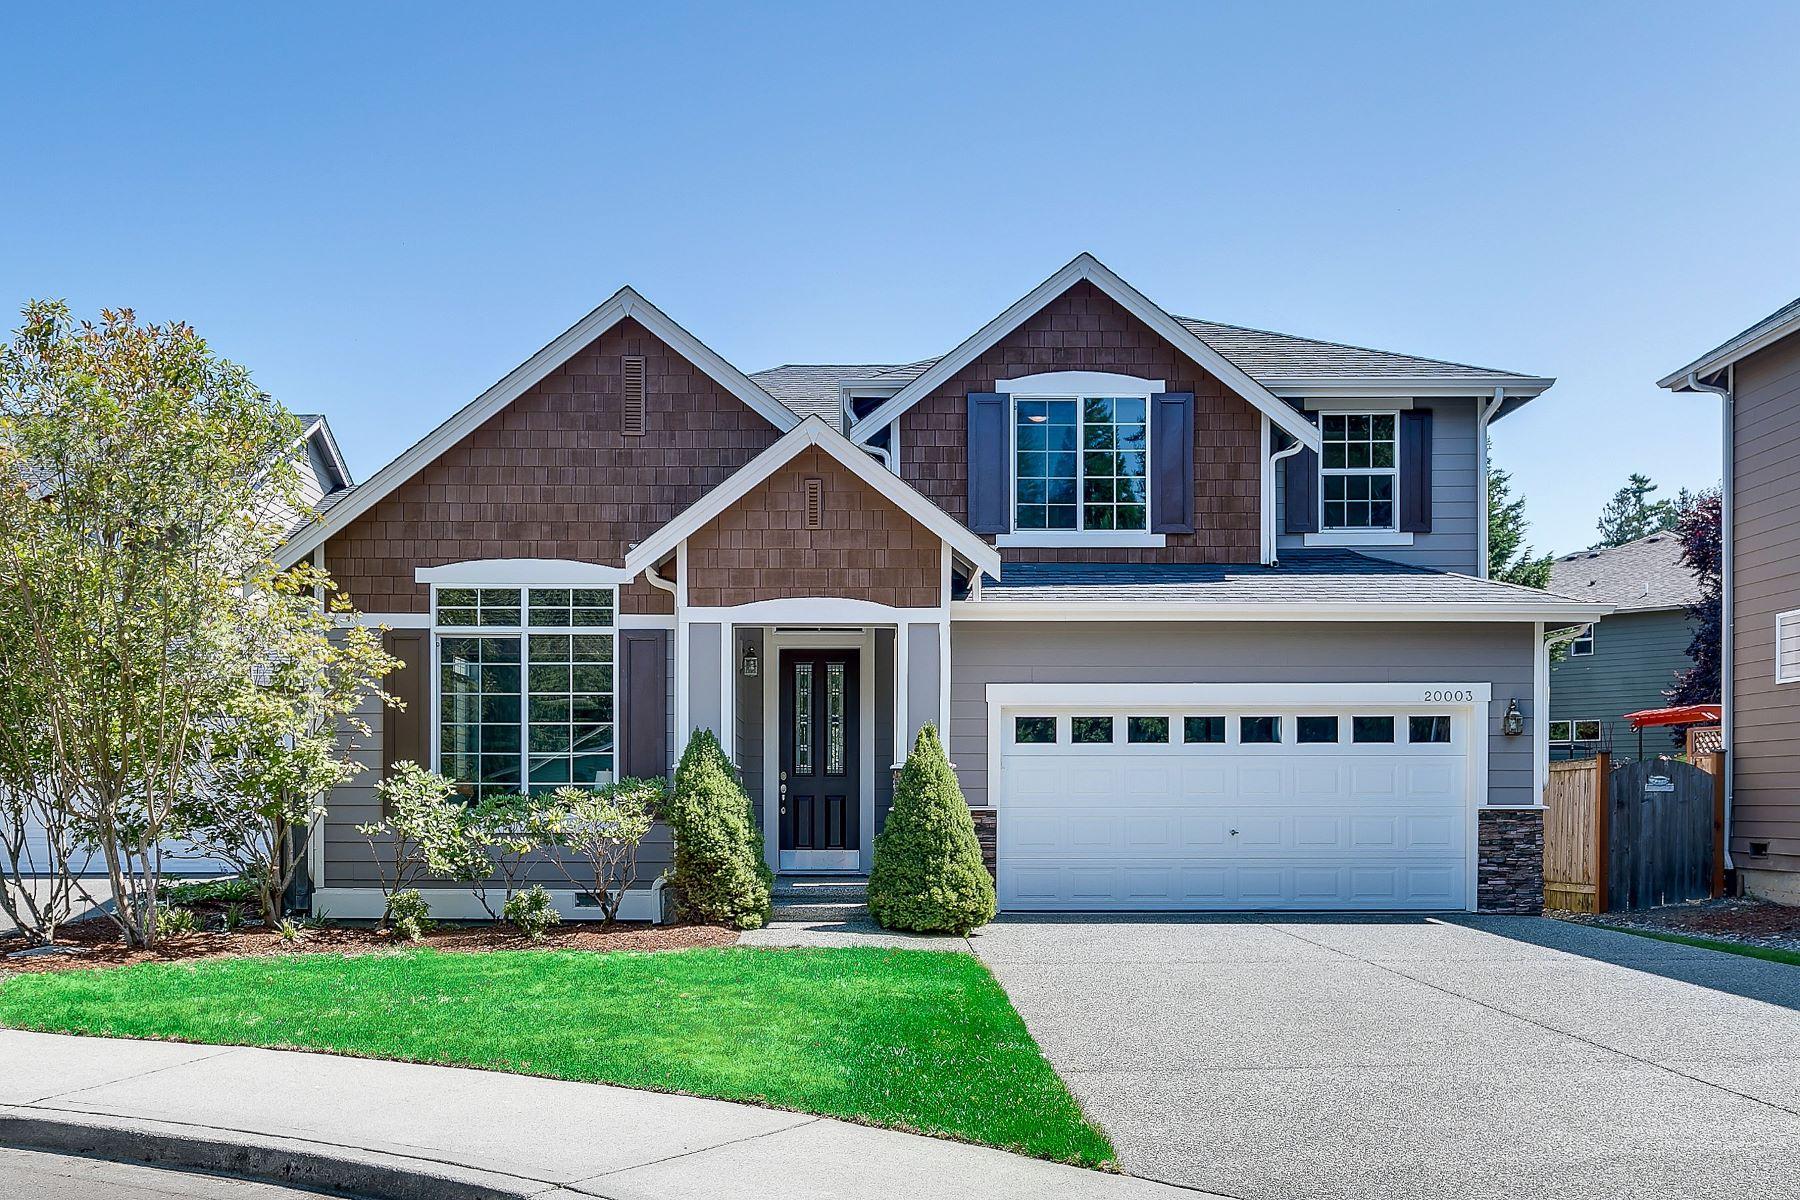 Single Family Homes for Sale at Lynnwood Beauty 20003 10th Ave W Lynnwood, Washington 98036 United States